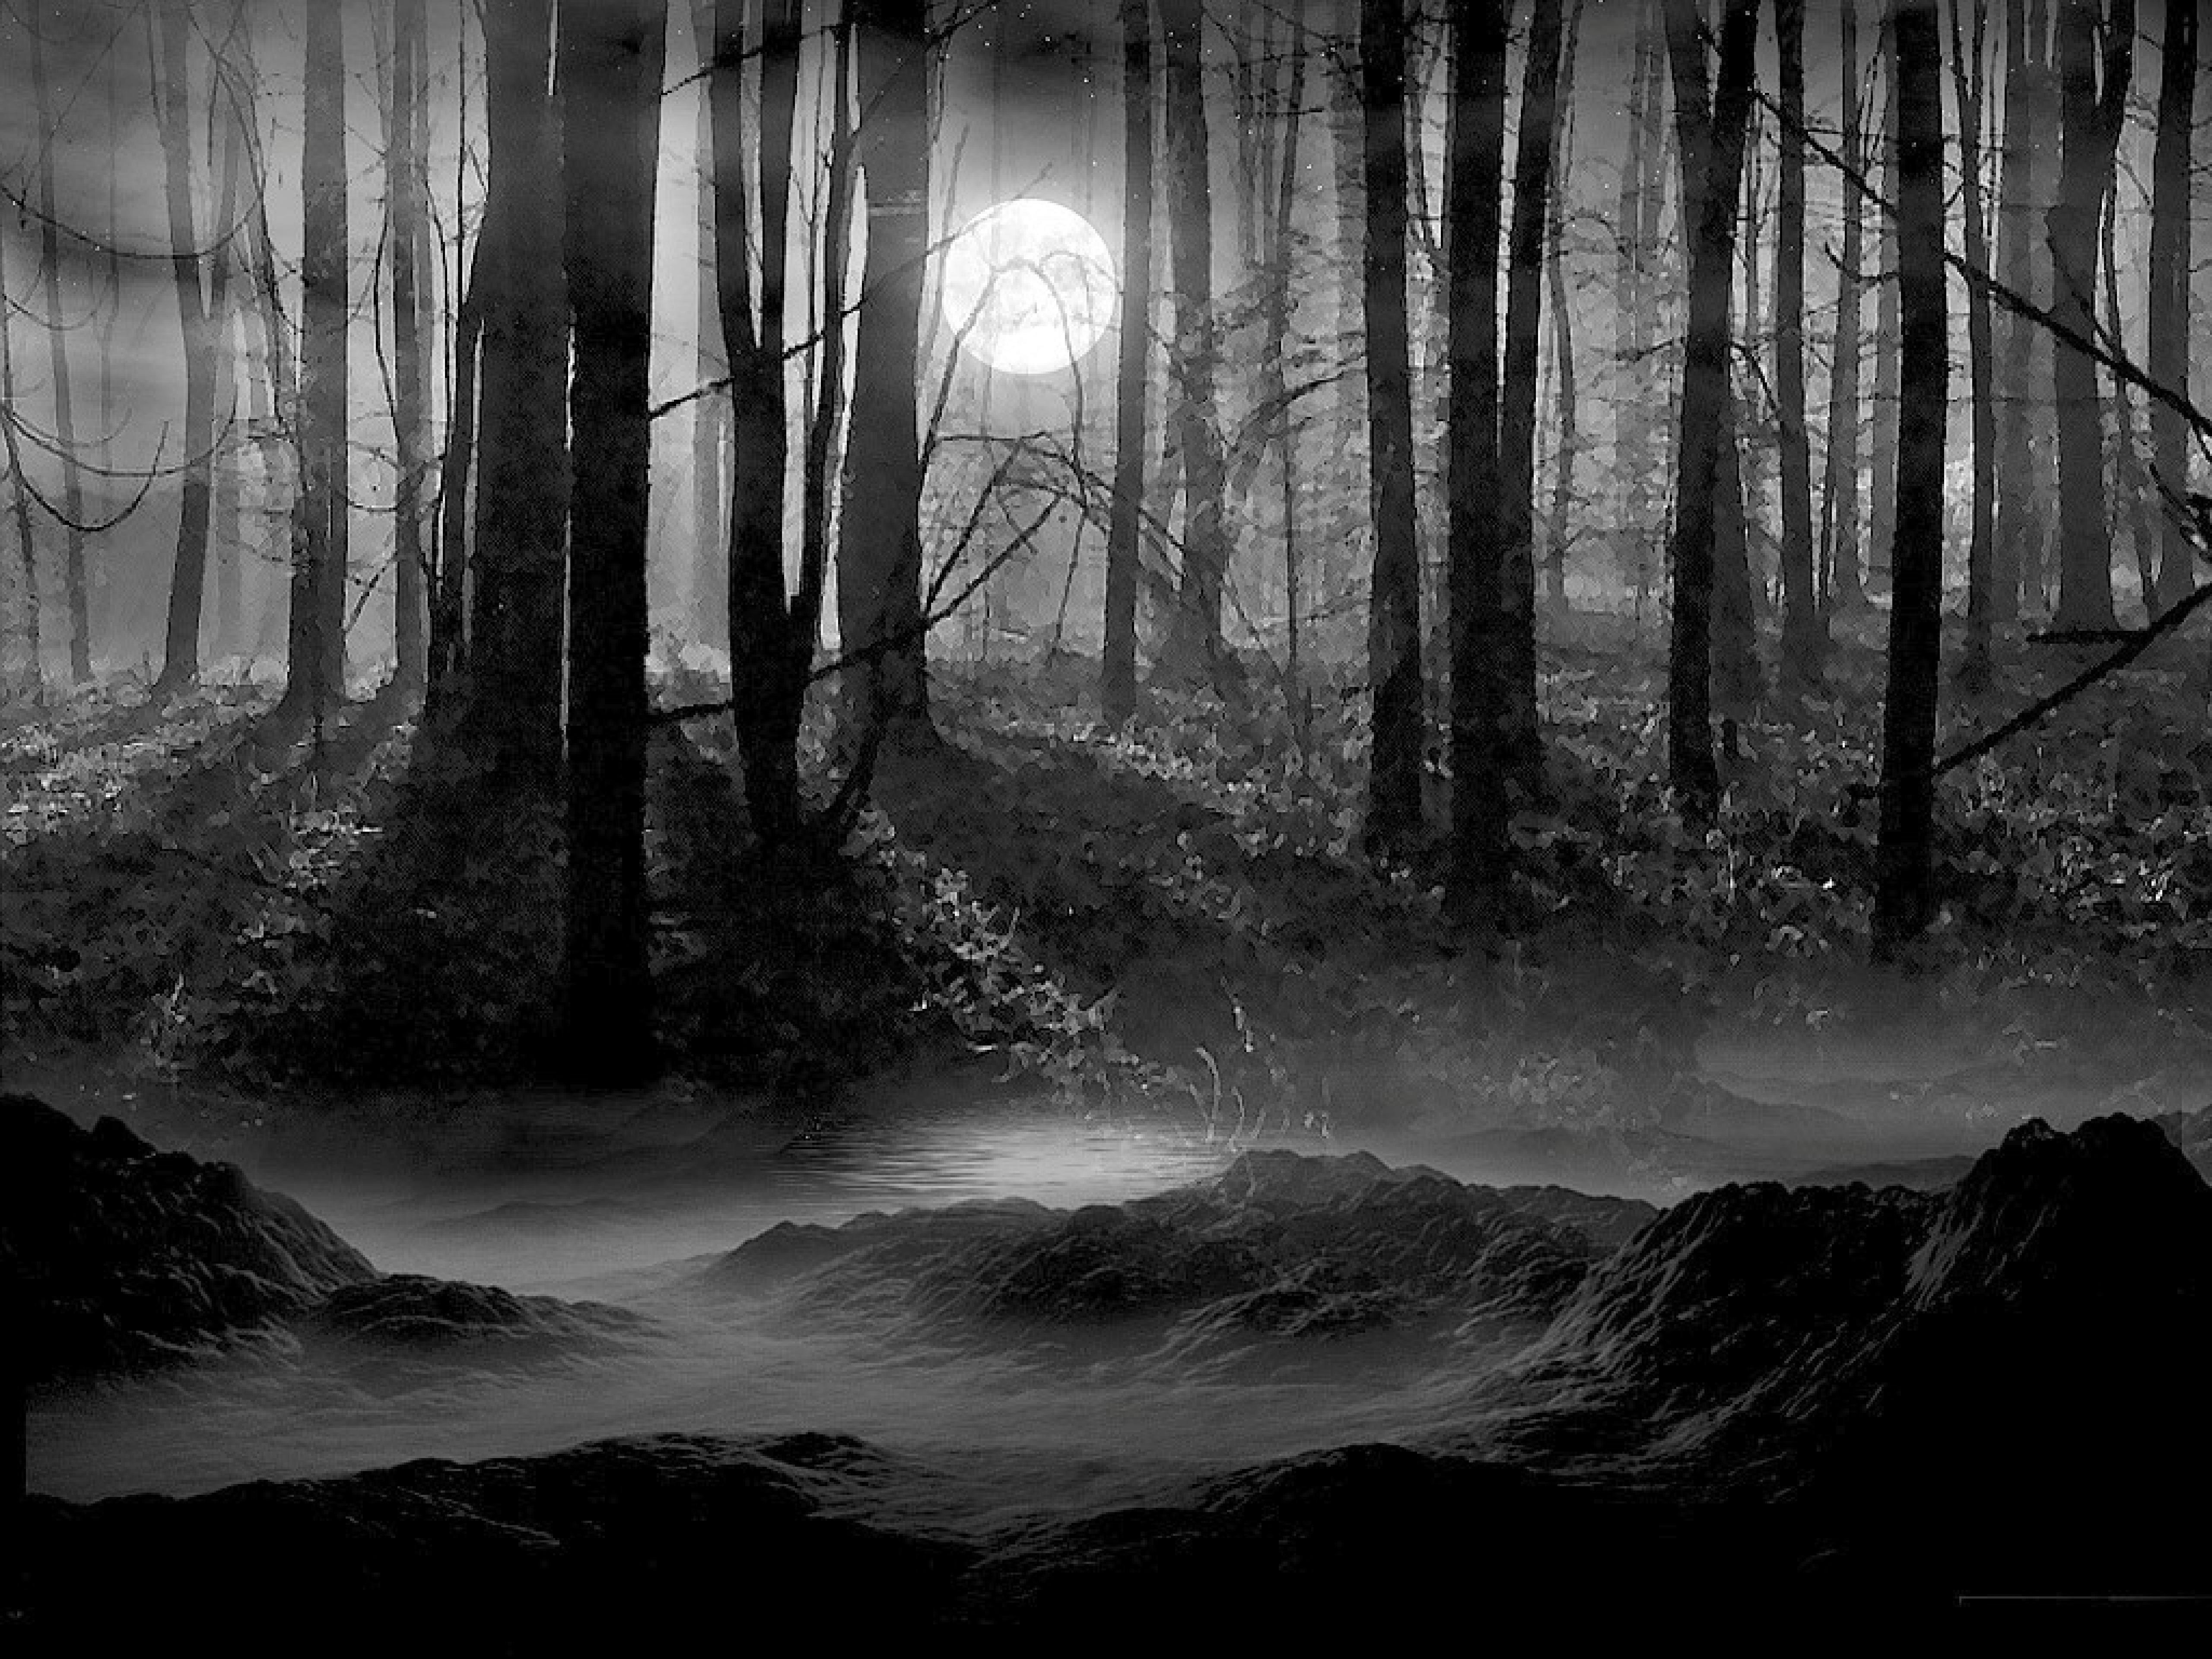 Dark Gothic Art Artwork Fantasy #123174 Kalais